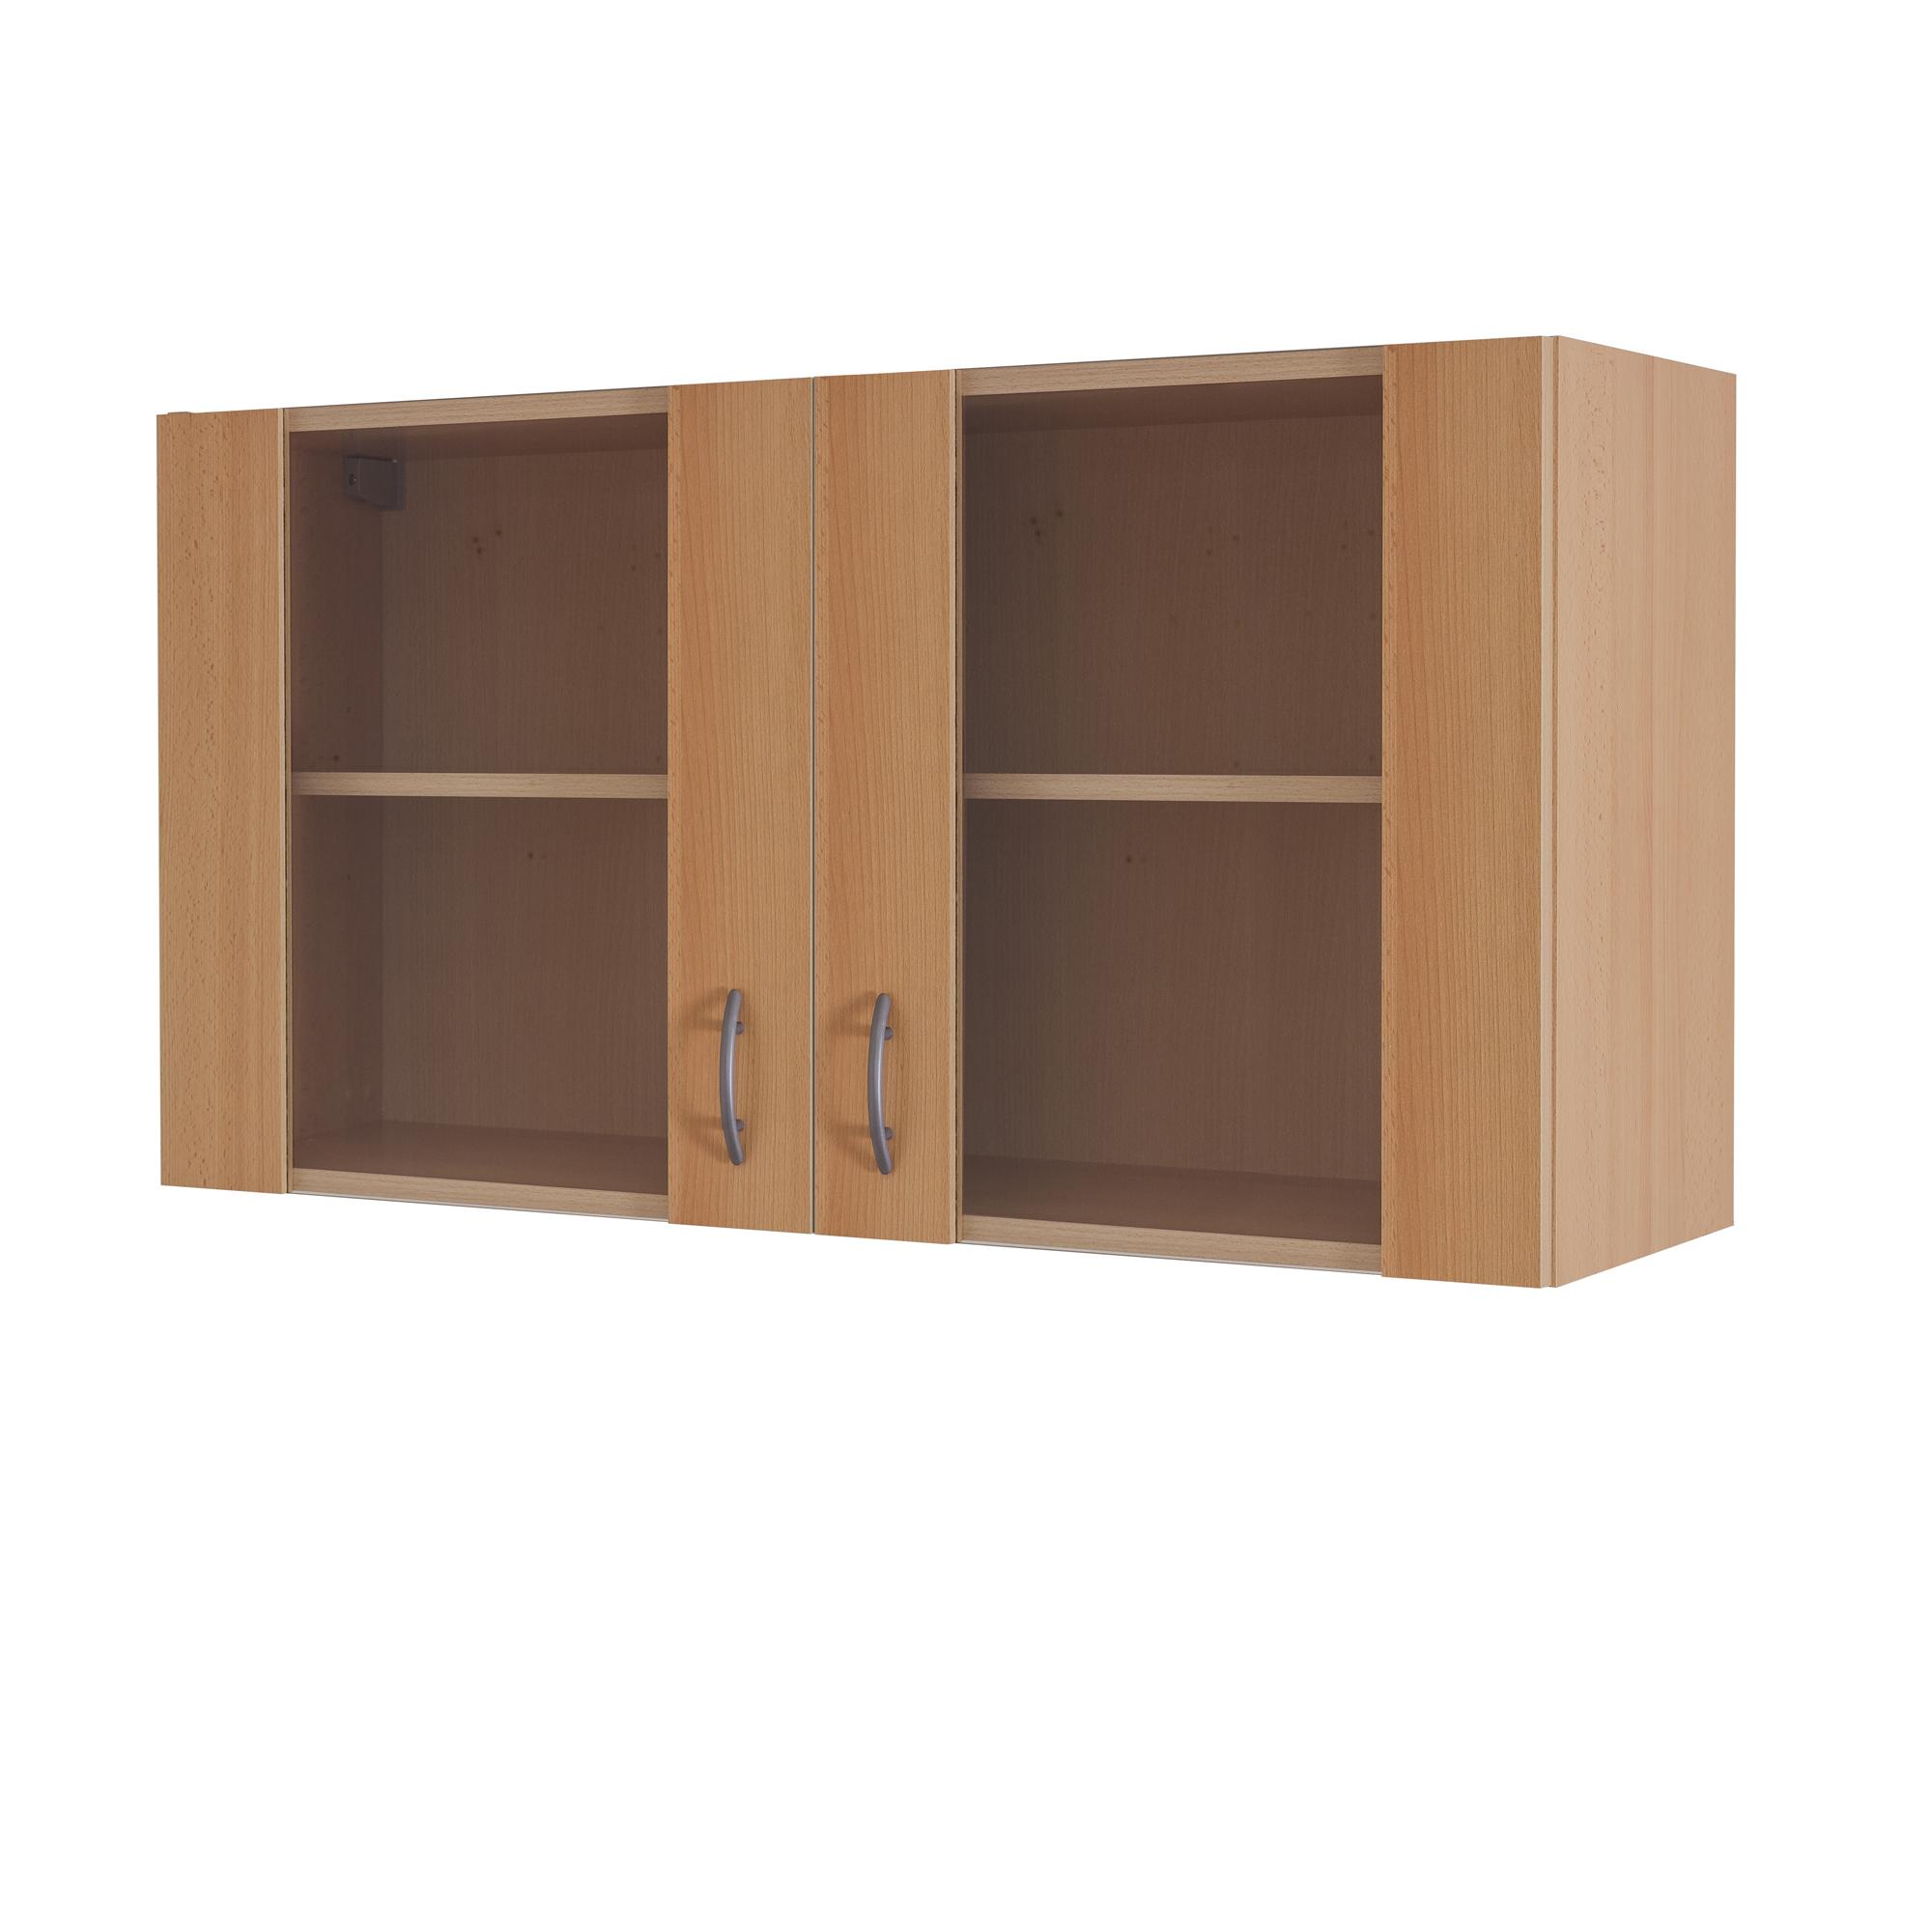 glas h ngeschrank k chen h ngeschrank oberschrank k chenschrank 100 cm buche ebay. Black Bedroom Furniture Sets. Home Design Ideas